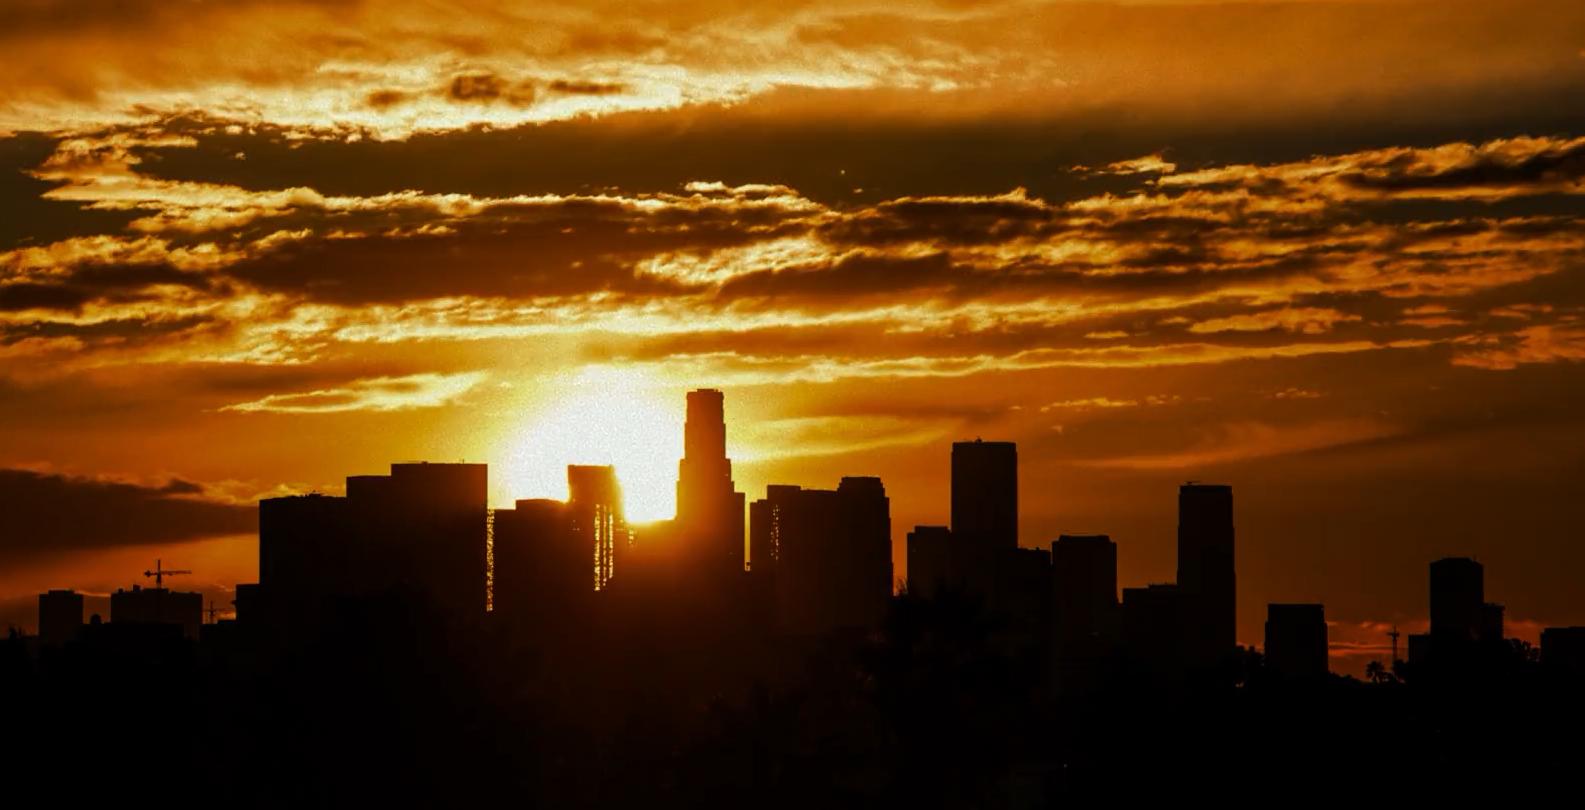 Los Angeles | Marvel Cinematic Universe Wiki | FANDOM powered by Wikia